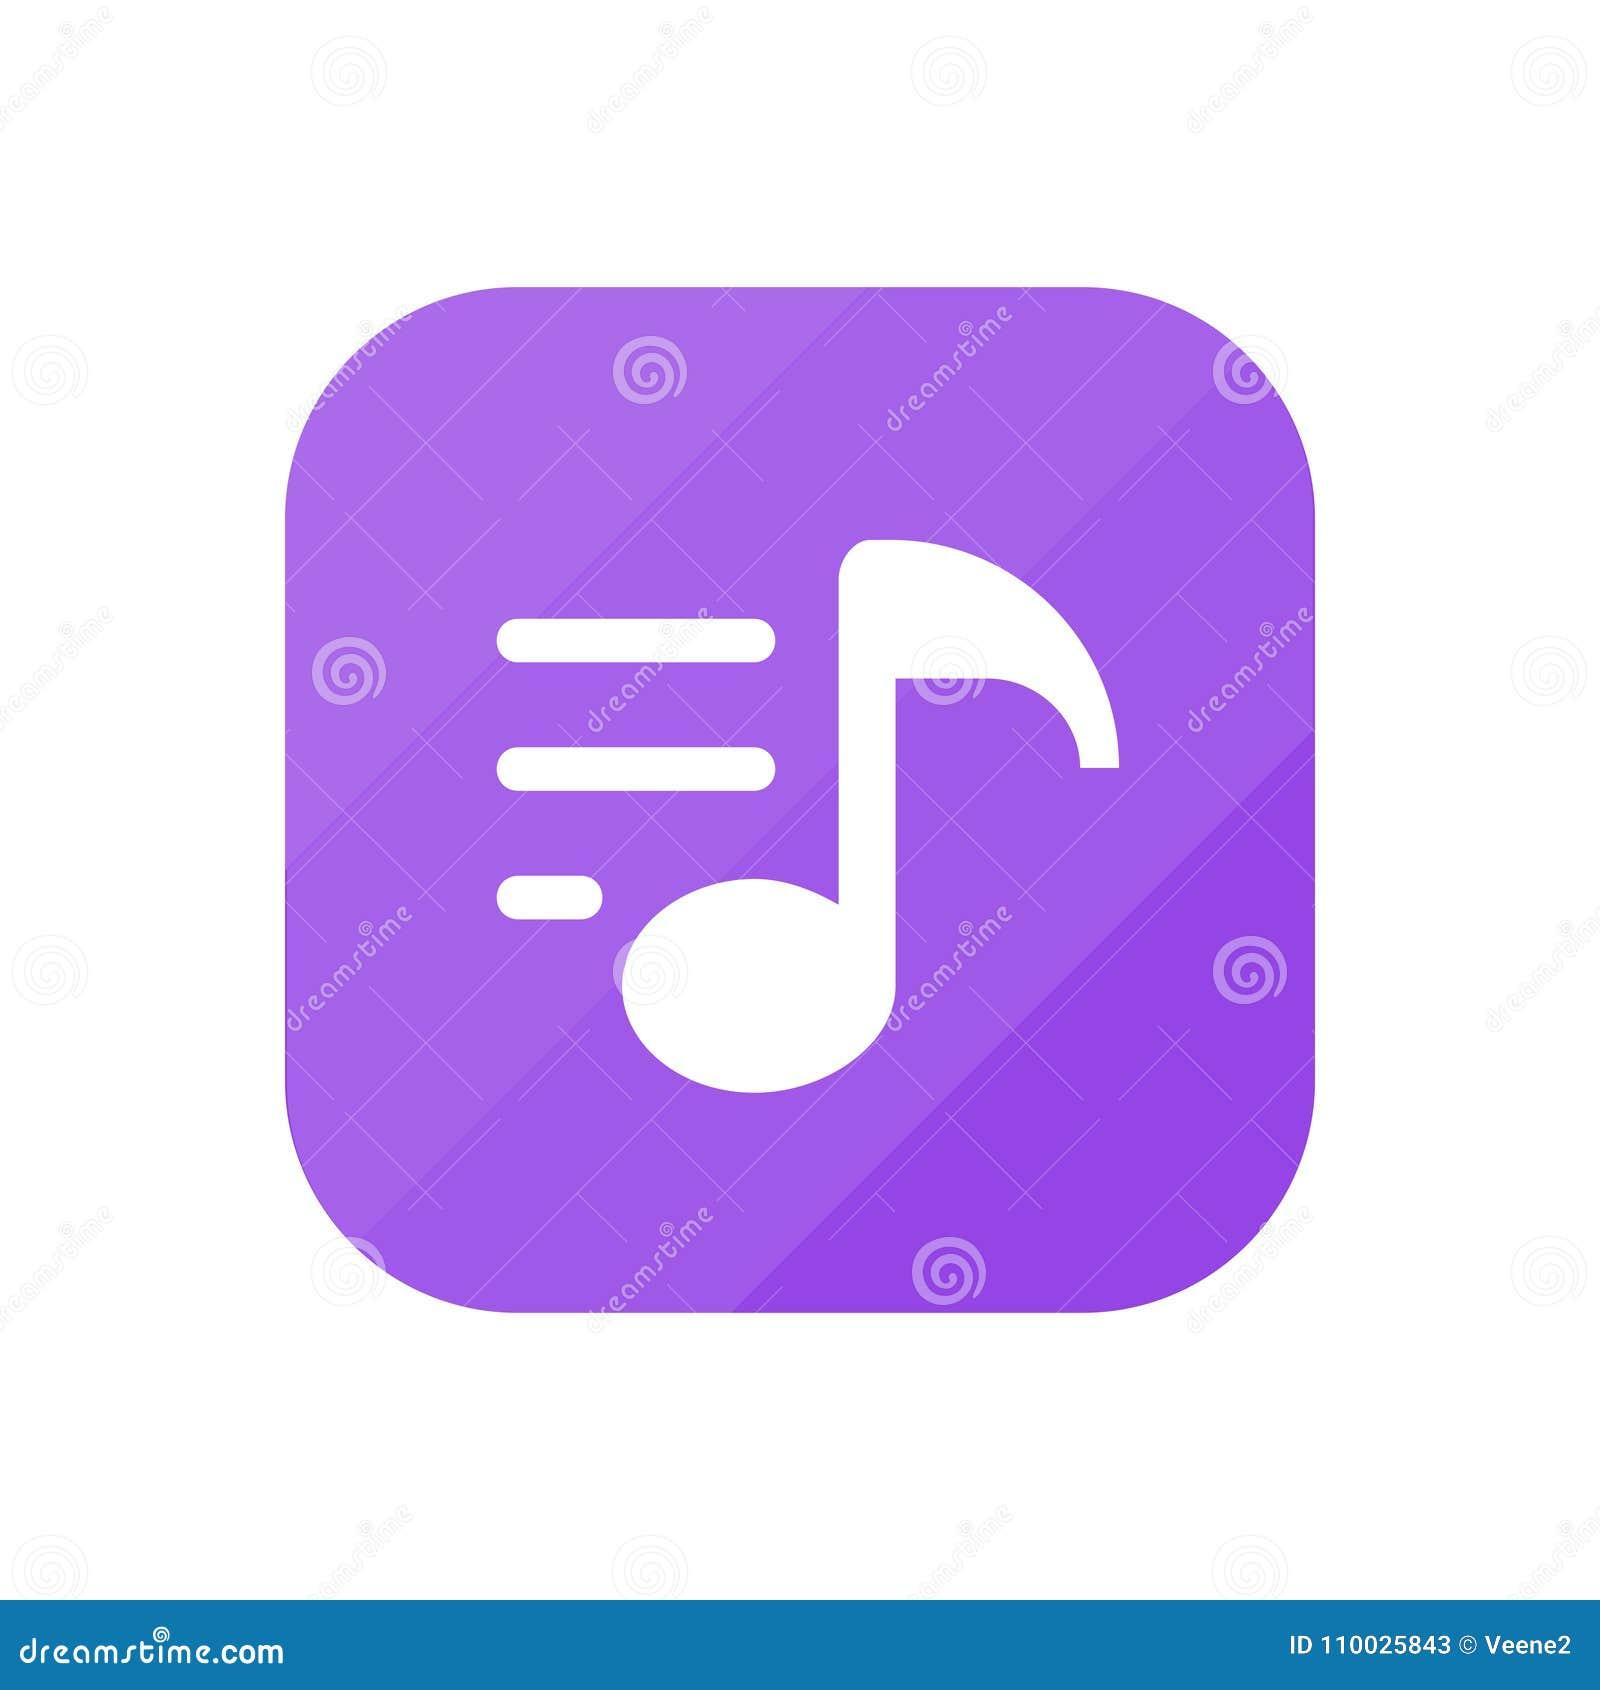 Playlist - App Pictogram